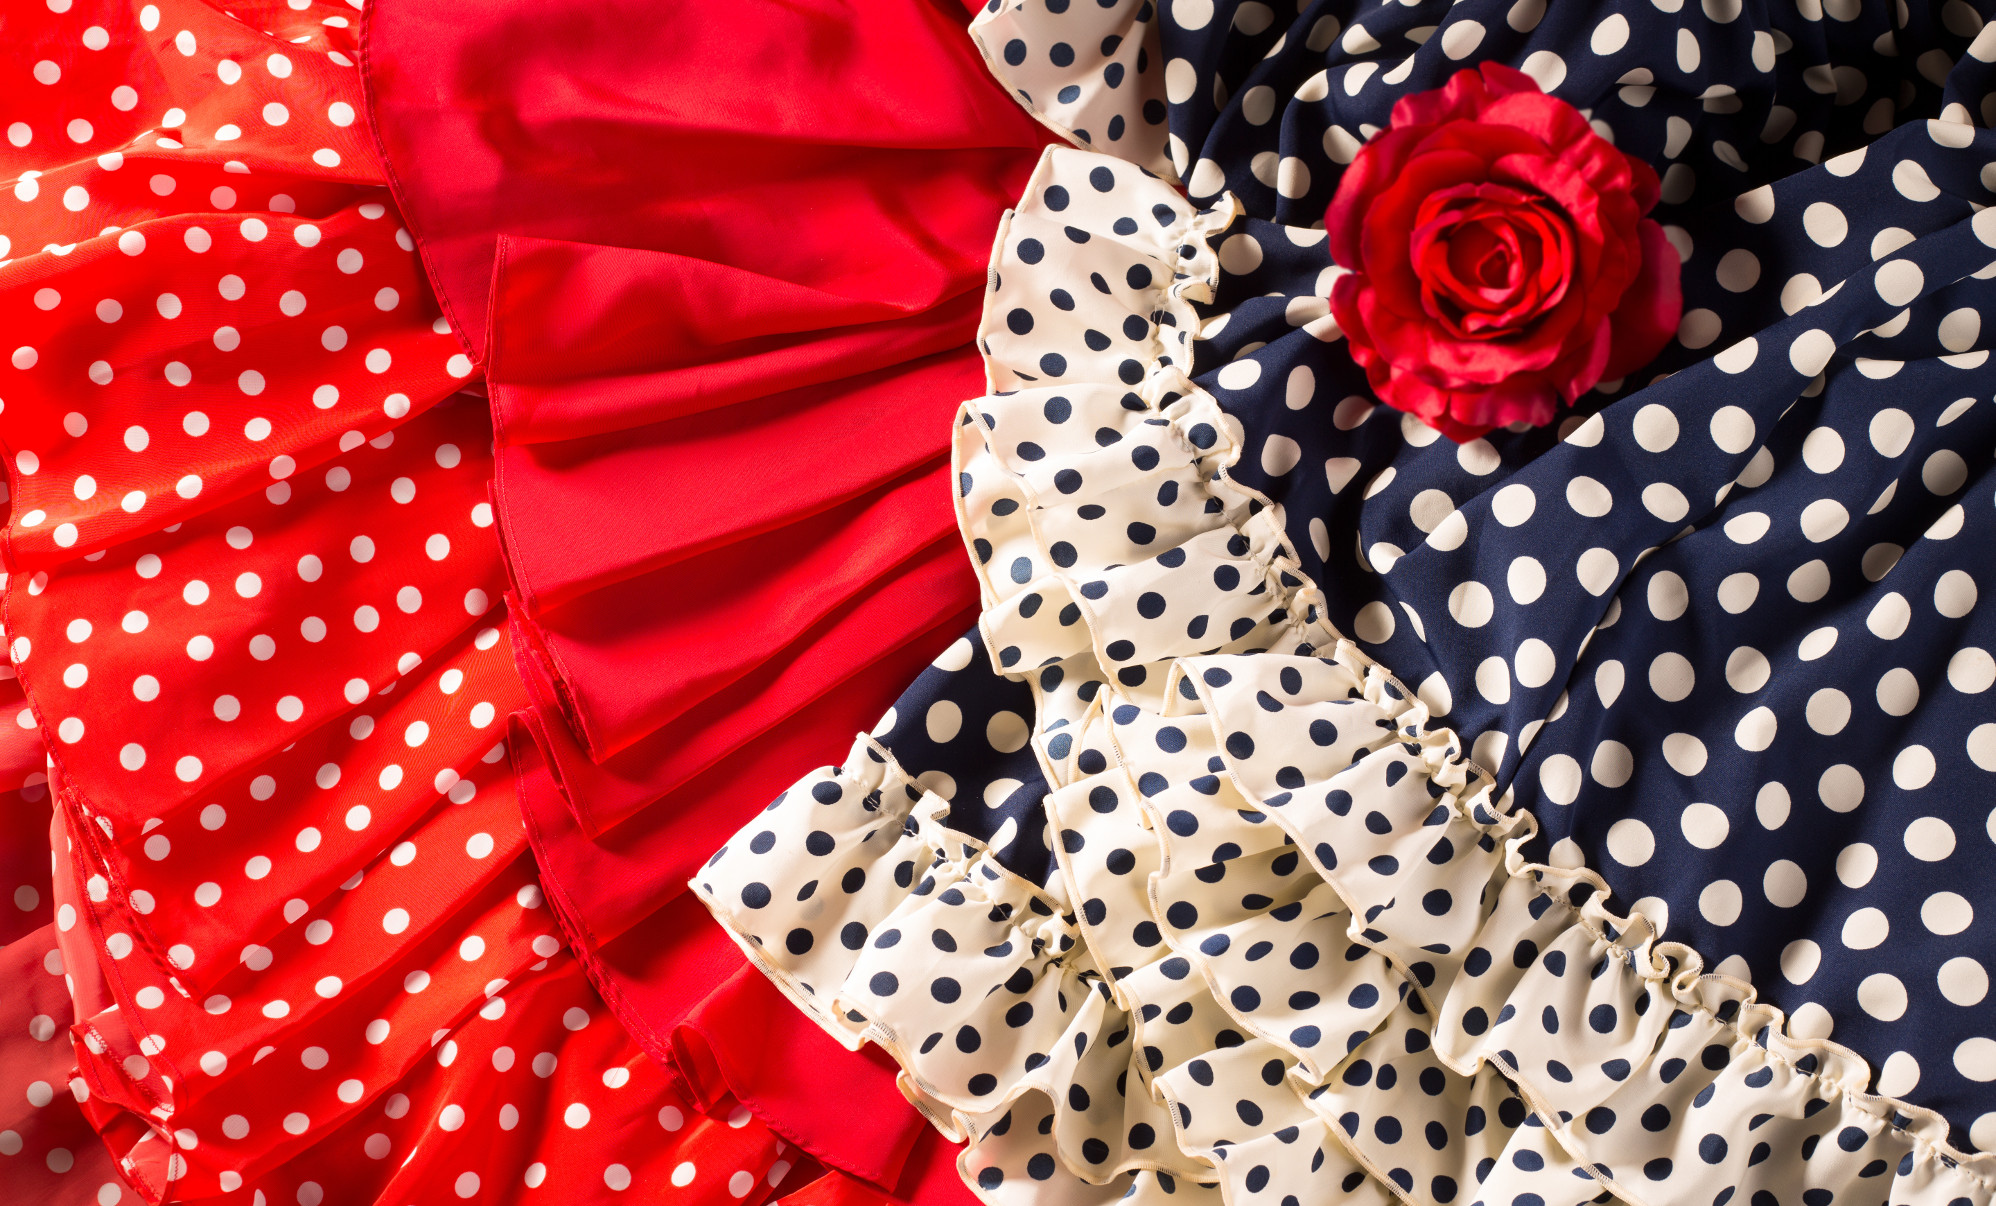 c322ffca9 Cuáles serán las tendencias en moda flamenca de Sevilla para este 2018